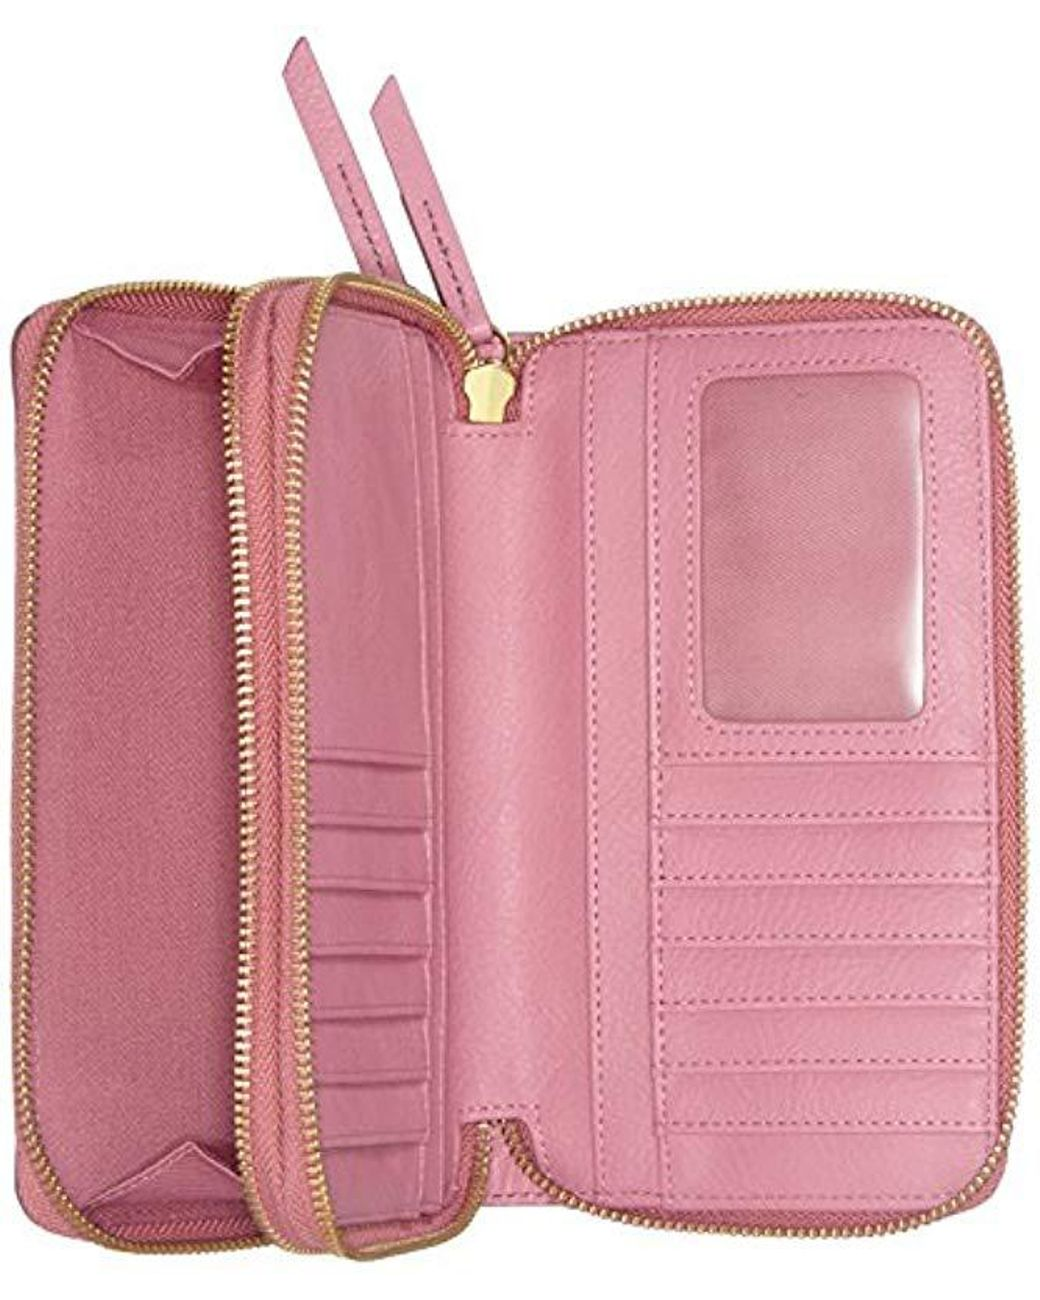 bfa0004c77d96 Fossil Damen Geldbörse   Raven Crossbody Geldbörse Wallet in Pink - Lyst